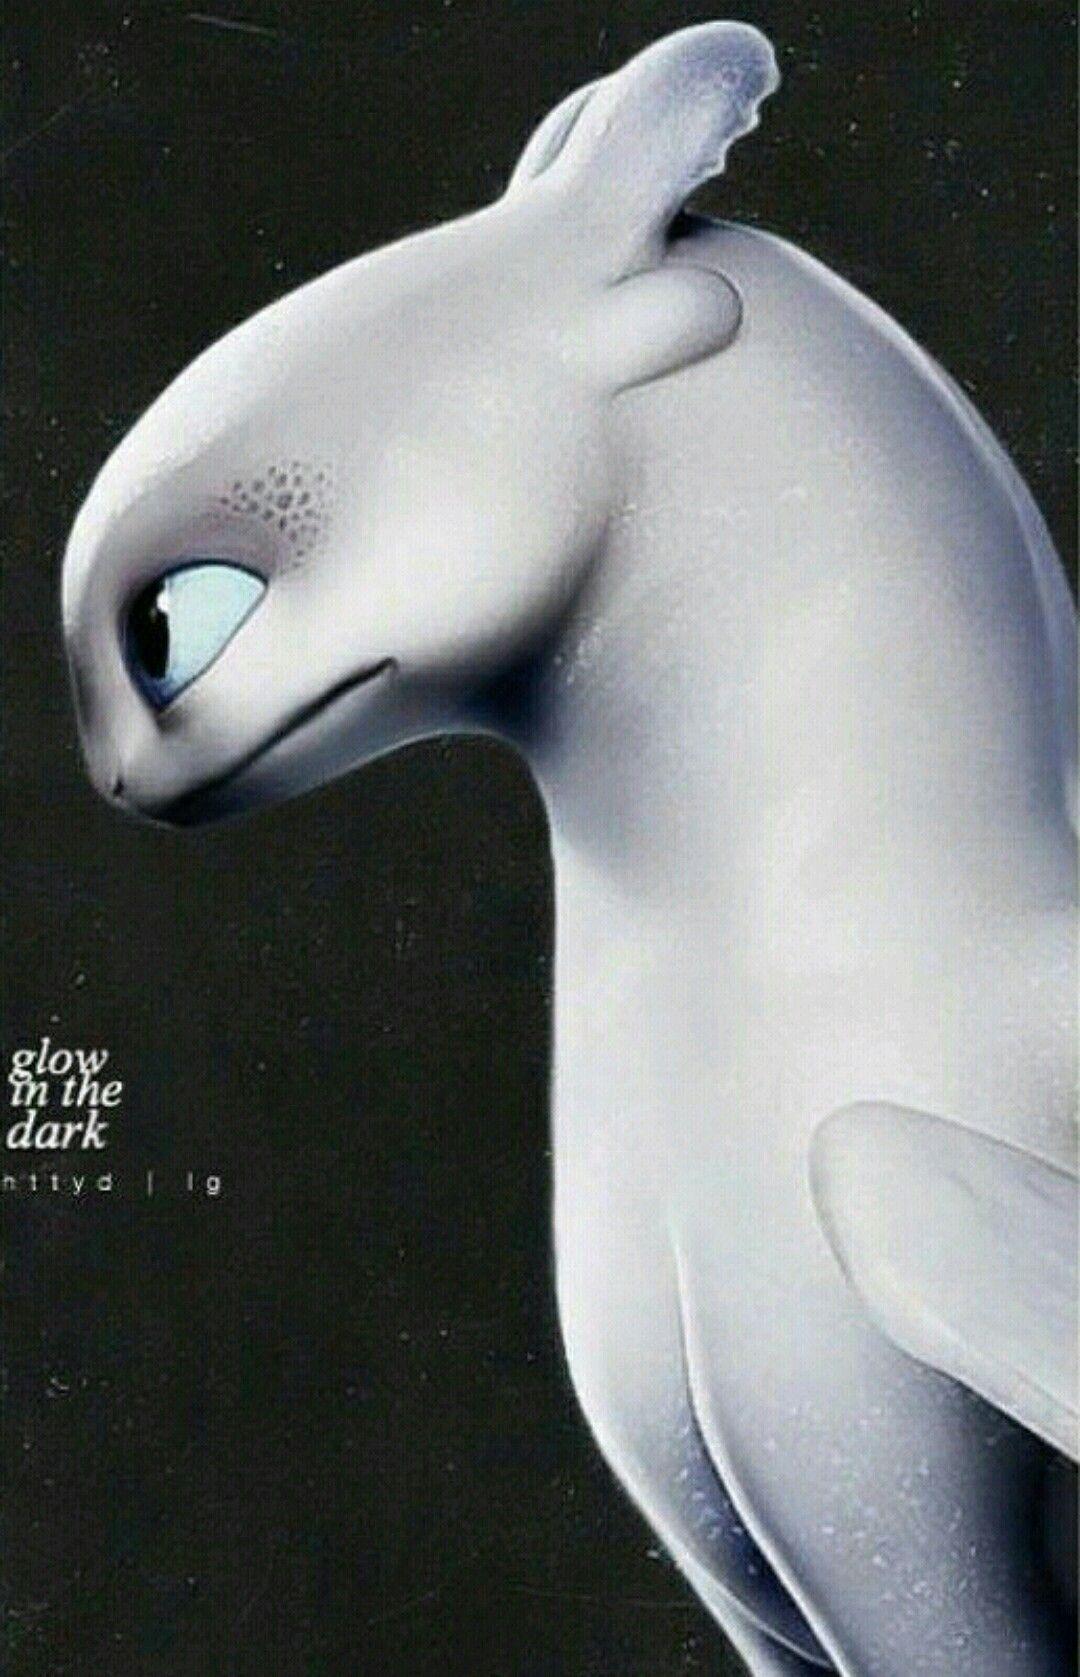 Glow In The Dark Papeis De Parede Casal Papel De Parede De